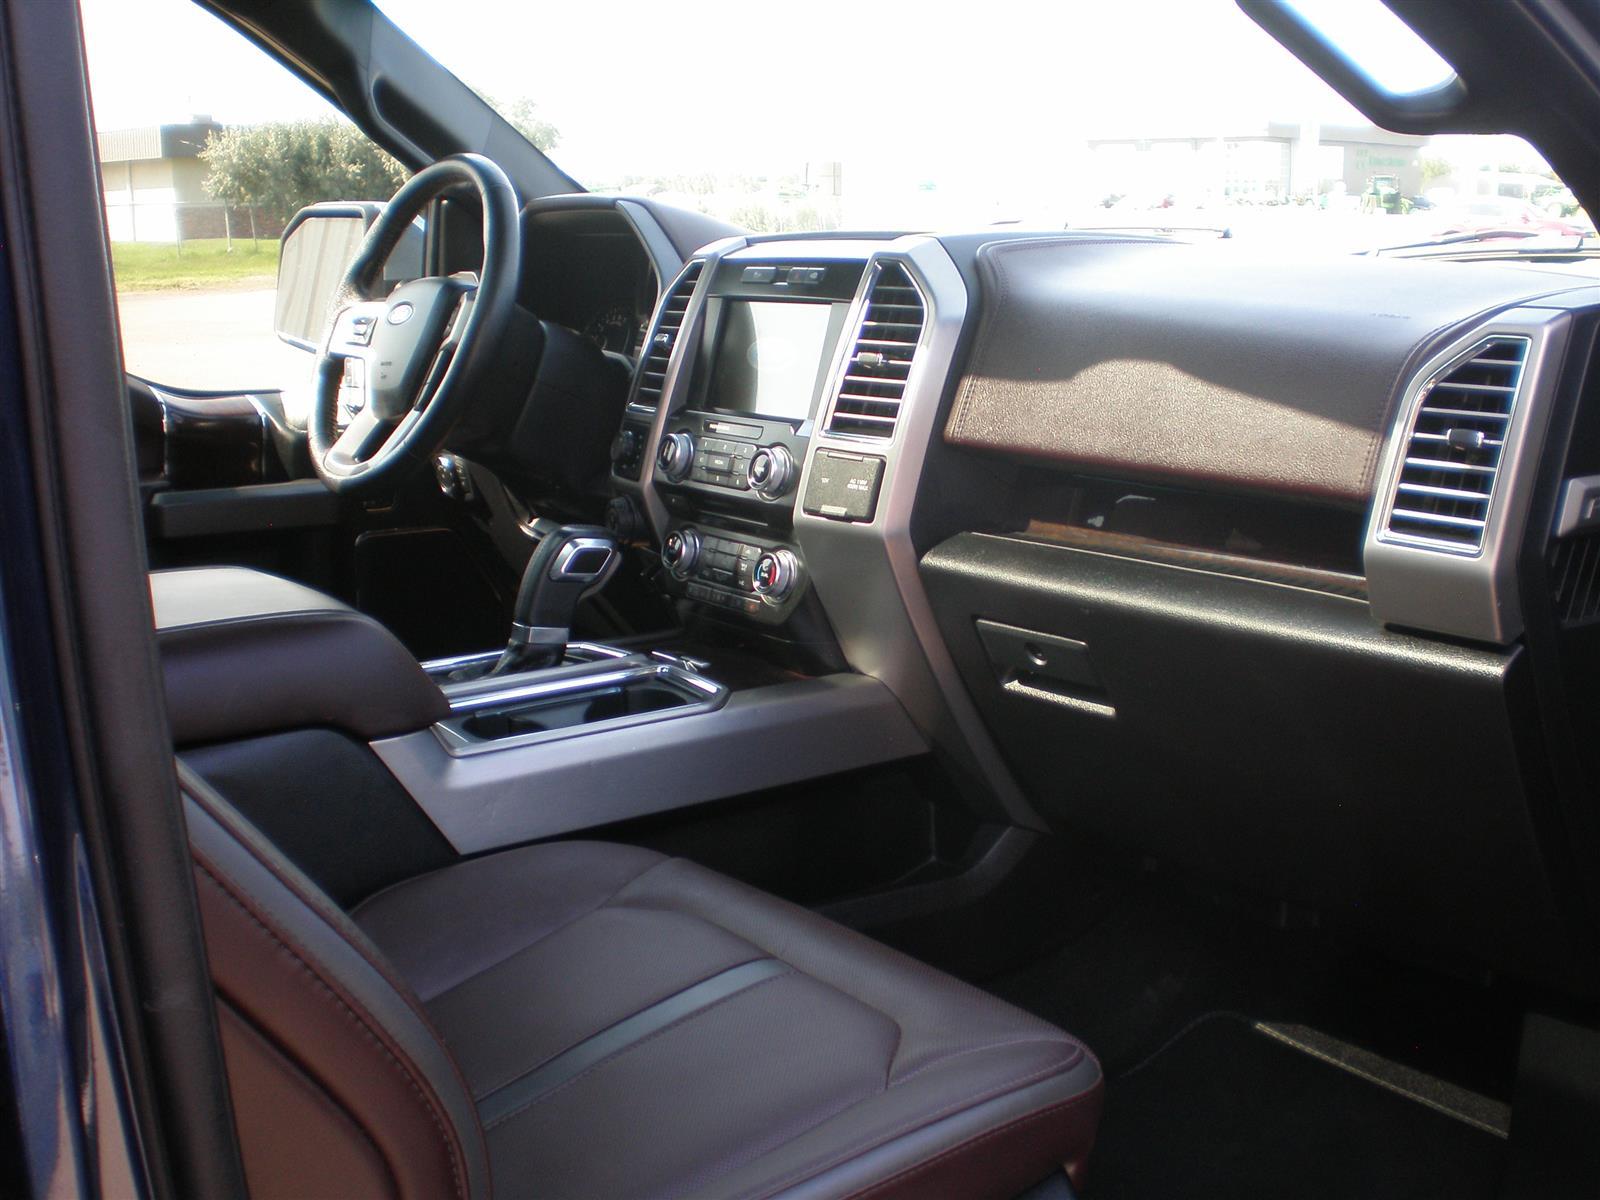 2016 Ford F-150 Platinum , 4wd , Supercrew, Nav